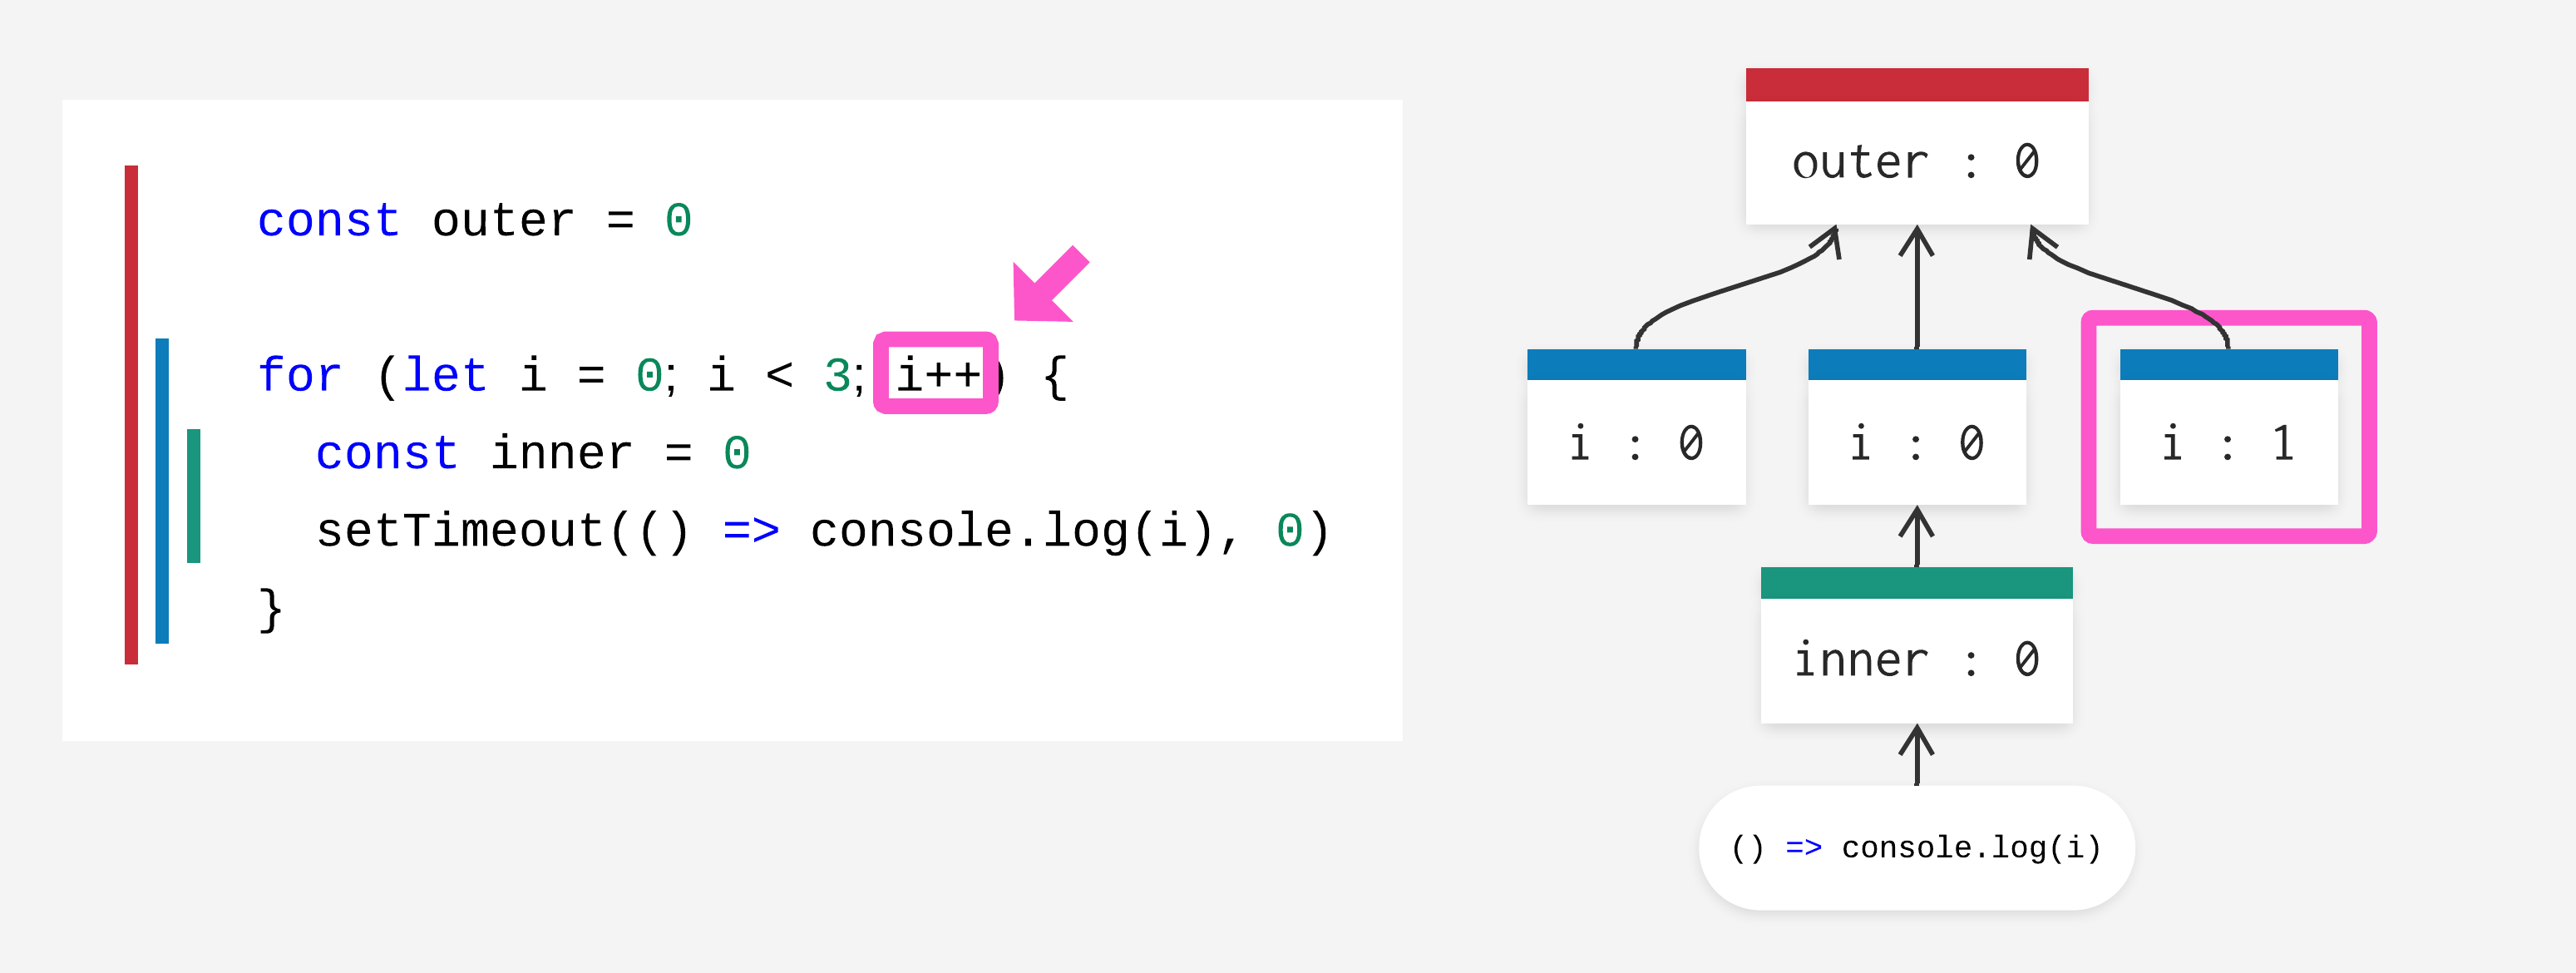 for-loop increment